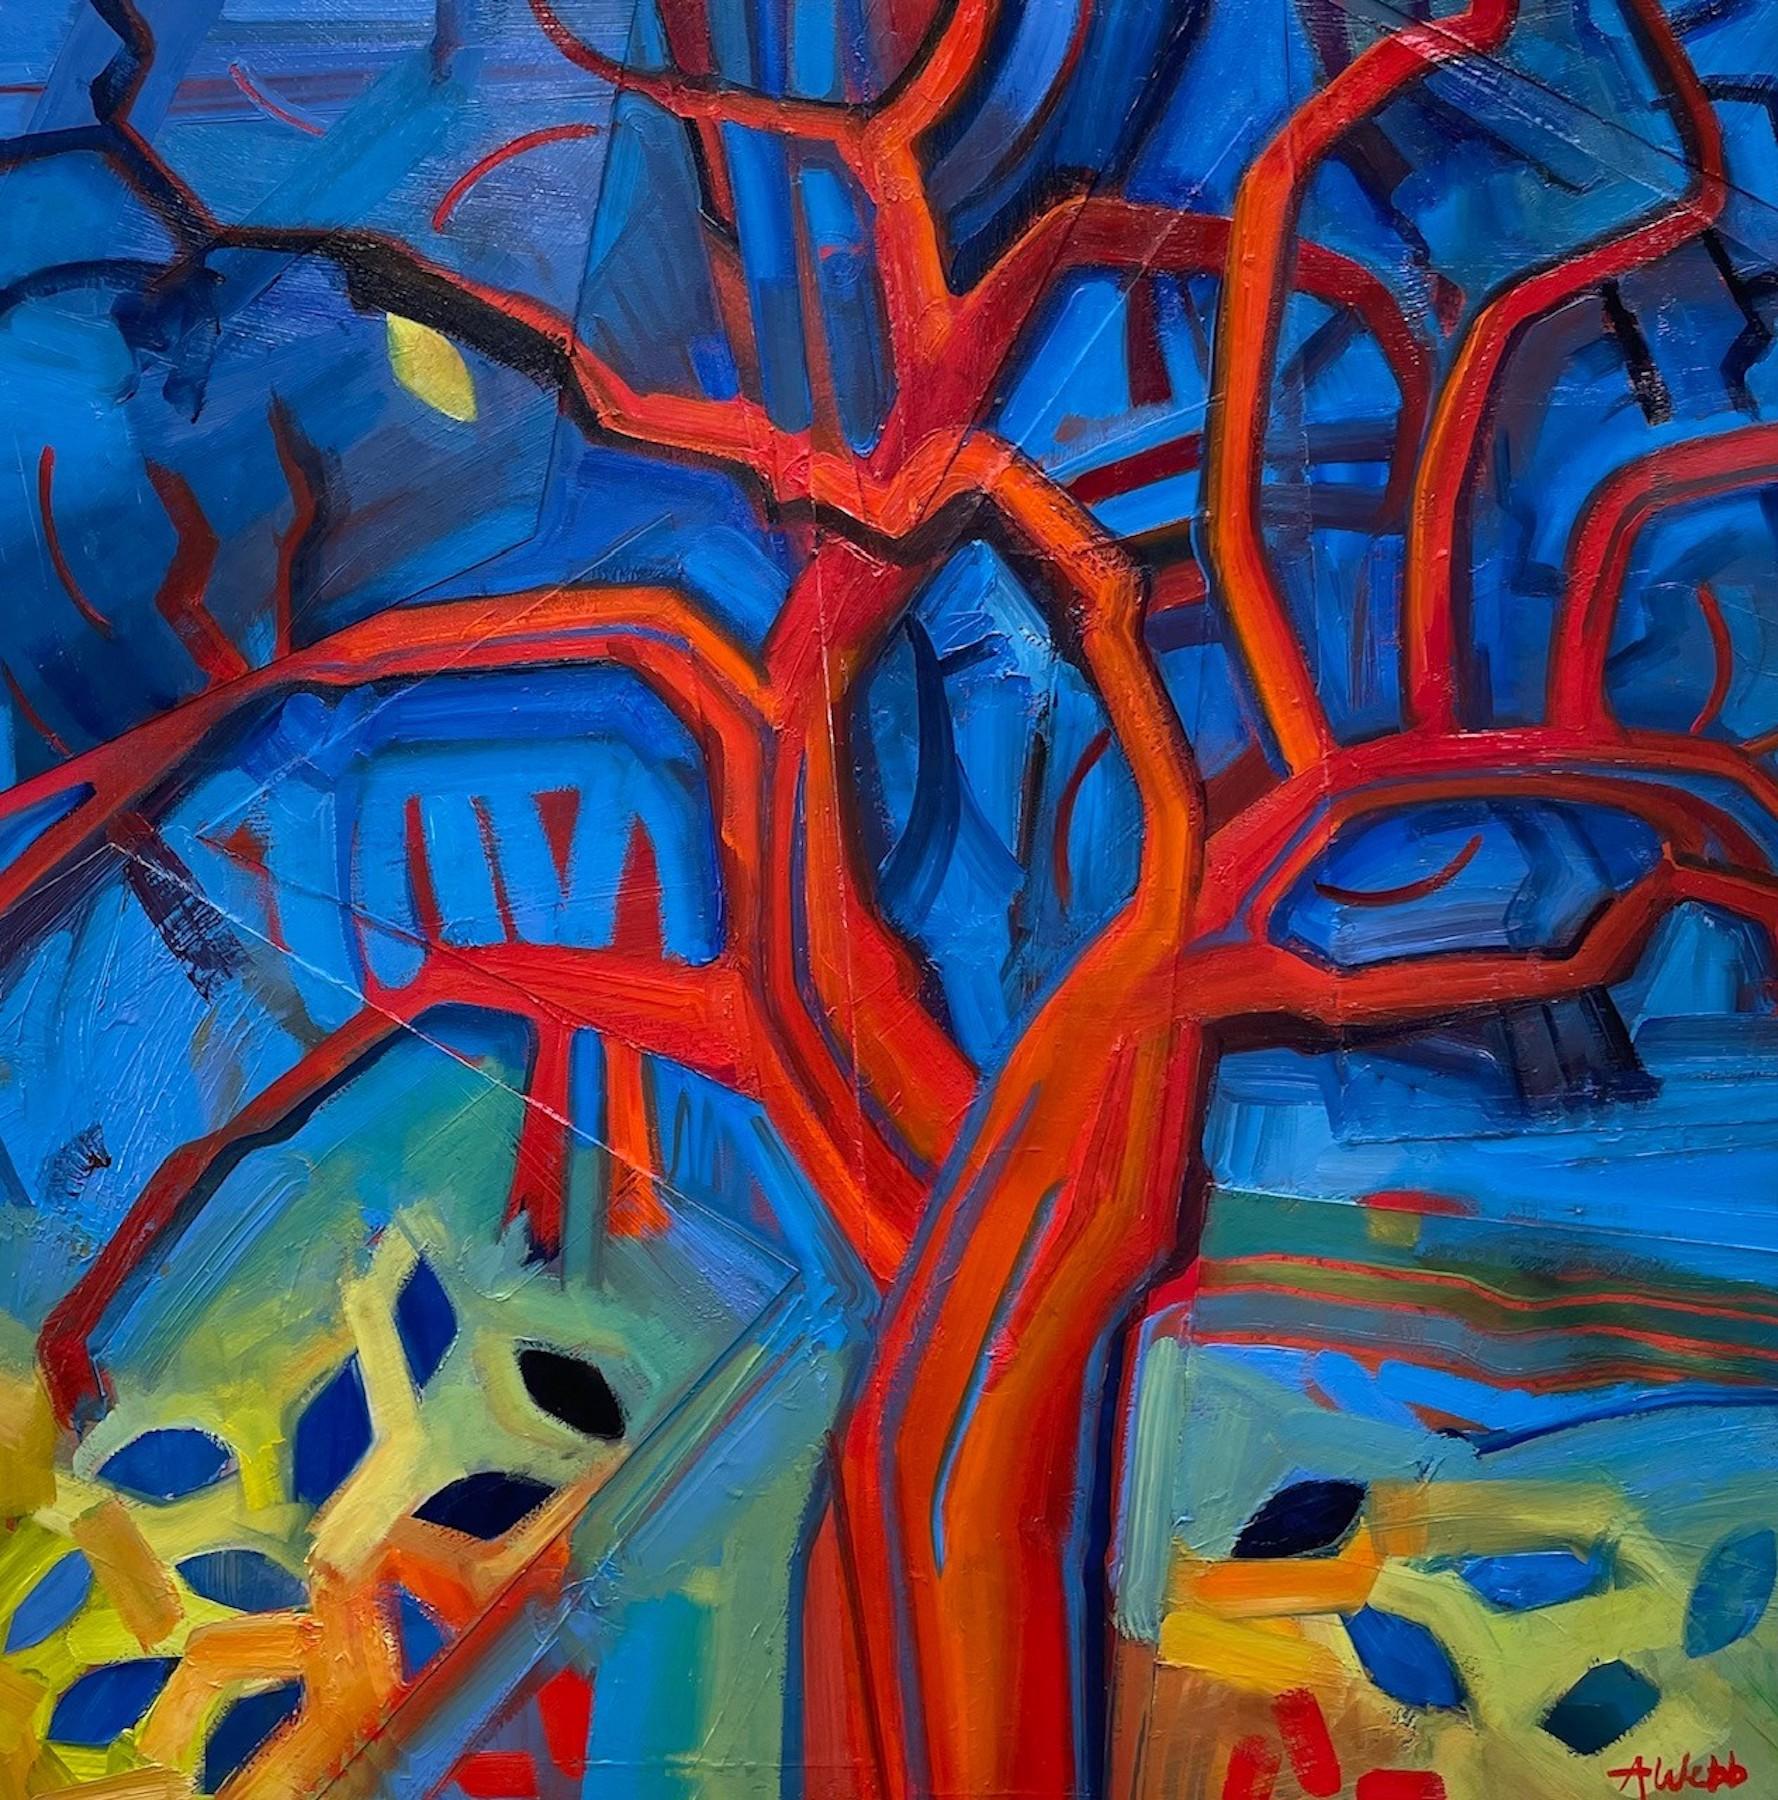 Alice Webb: The Red Tree